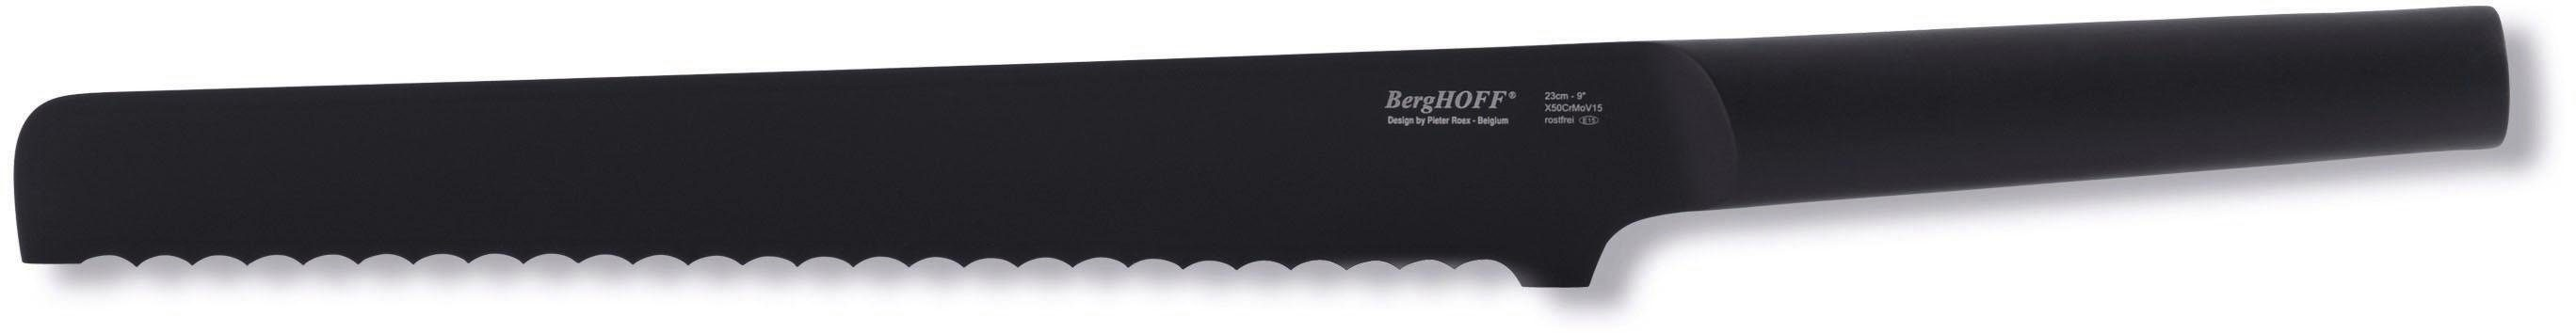 BergHOFF Brotmesser, 23 cm, »Ron Line«